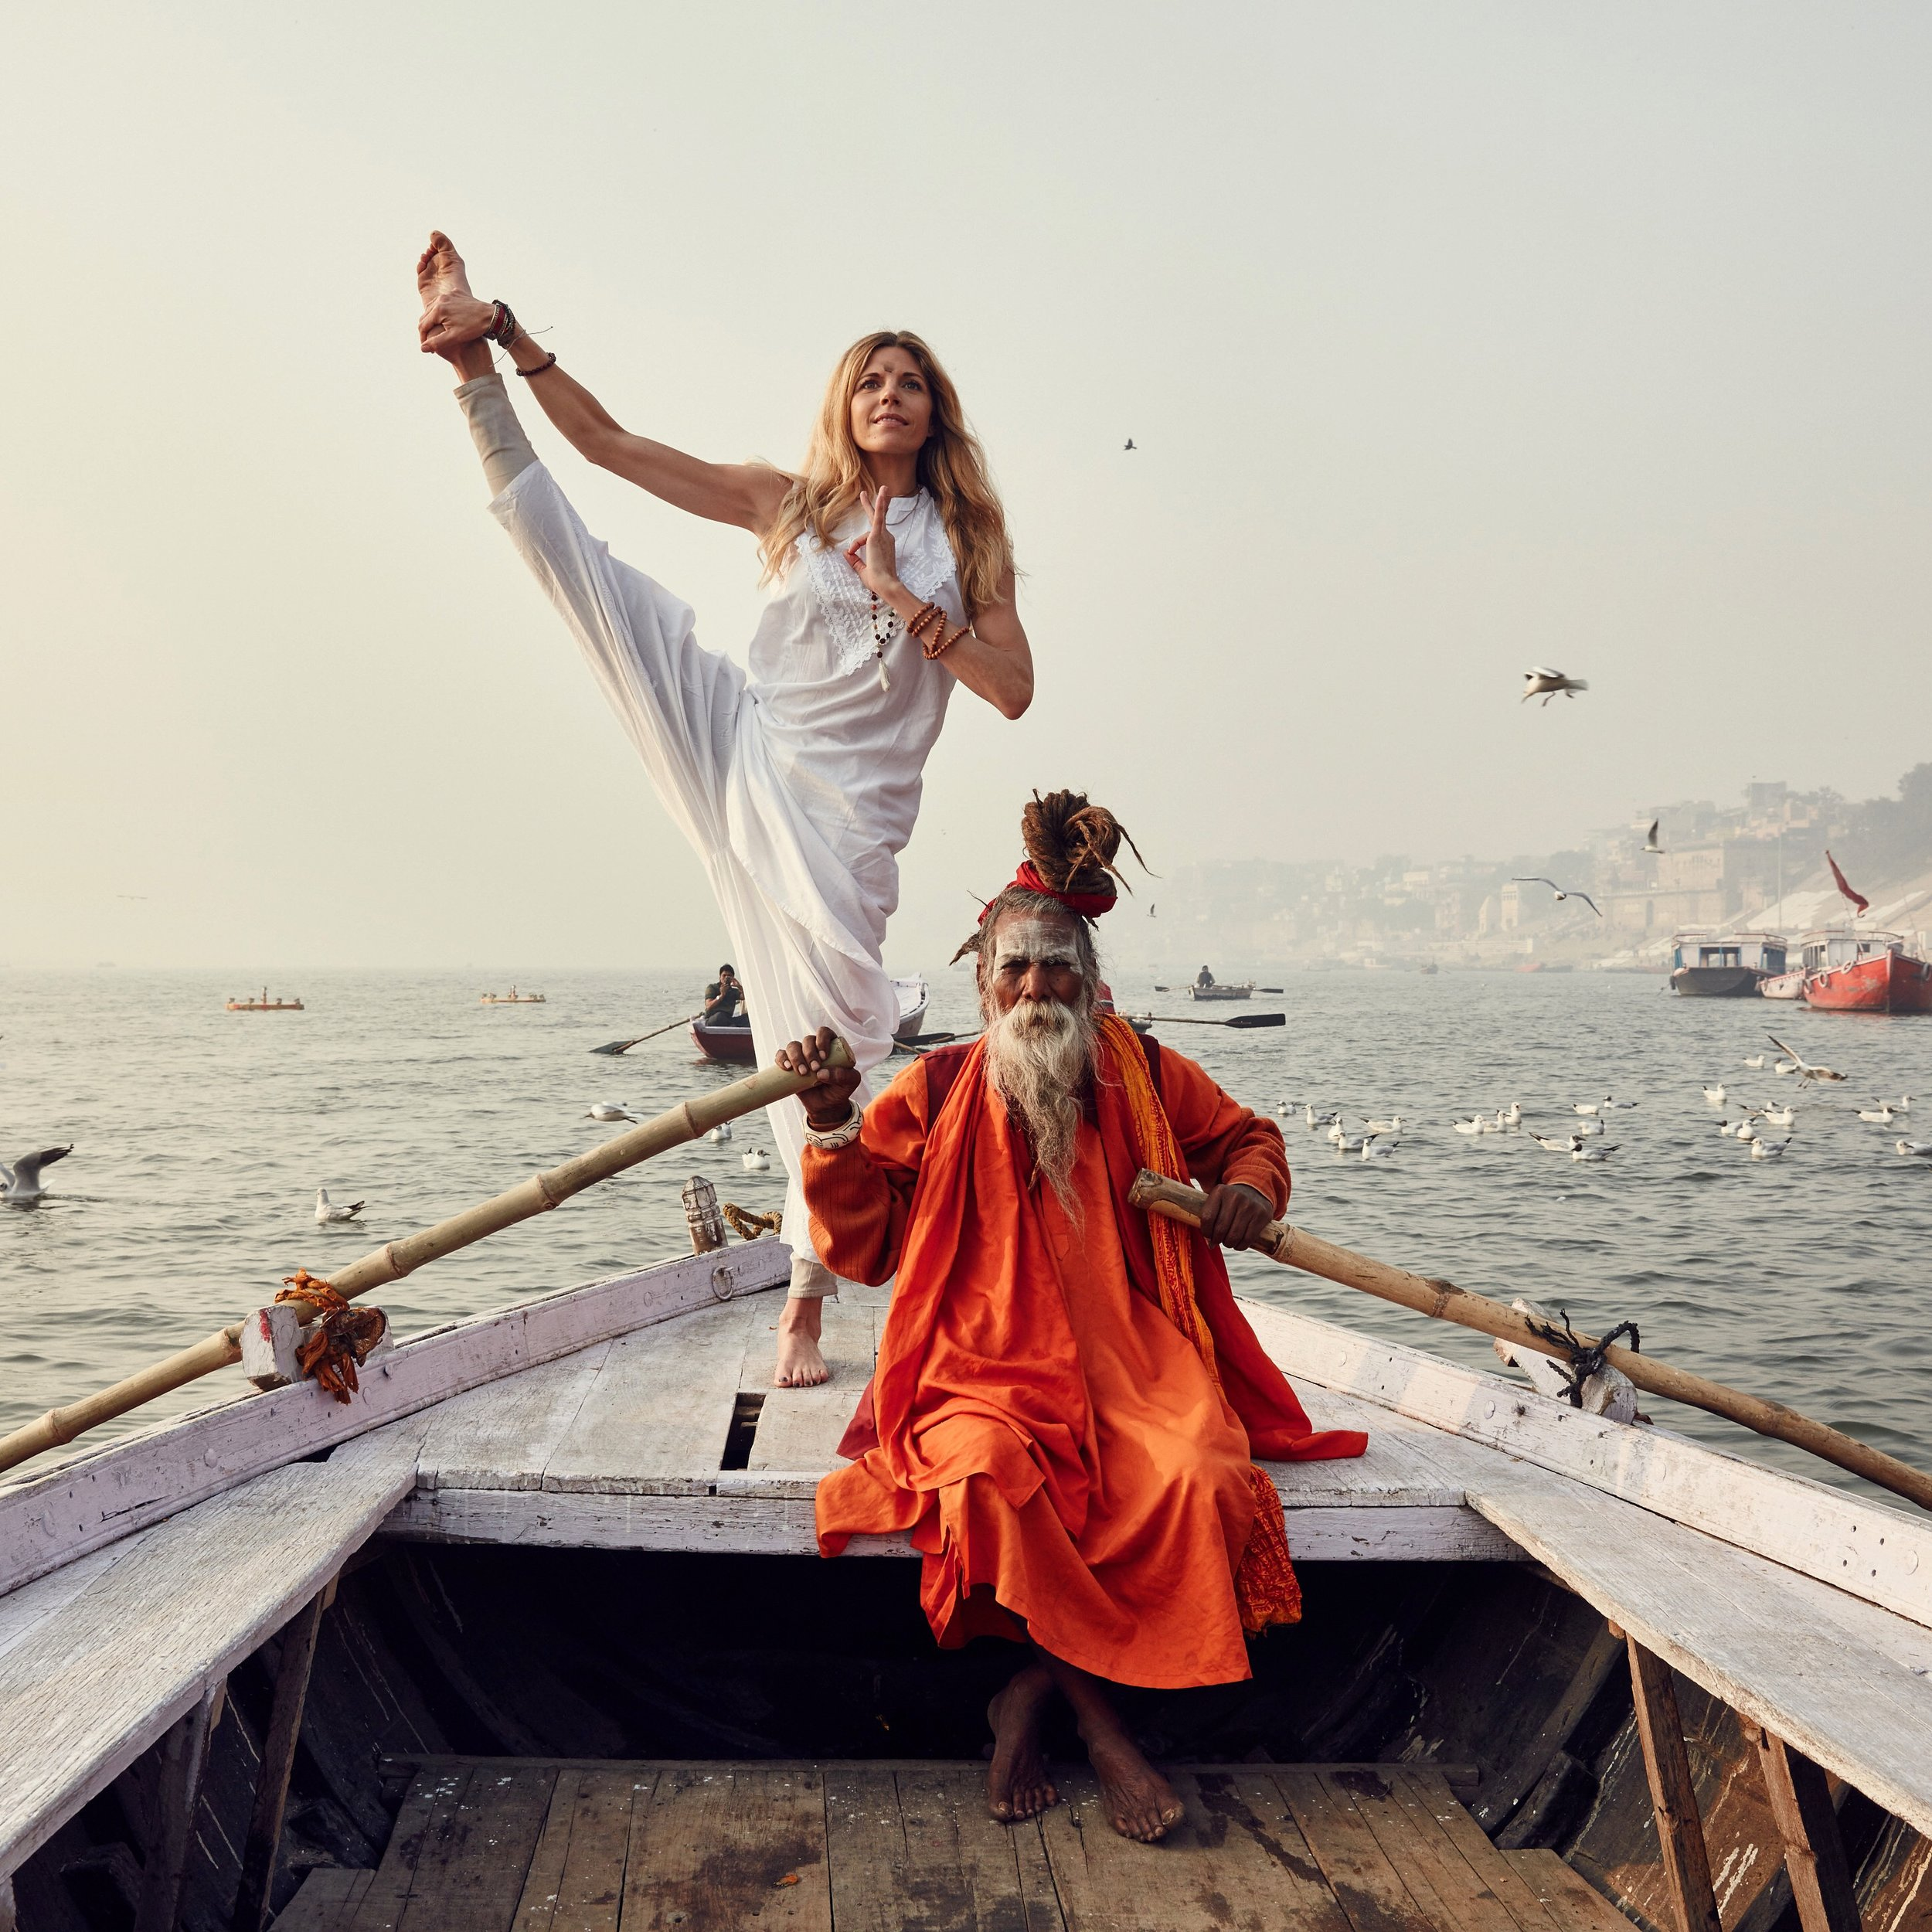 Andrea Bogart, Yoga, Wine Country Yoga Events, Yoga Practice, Self Care